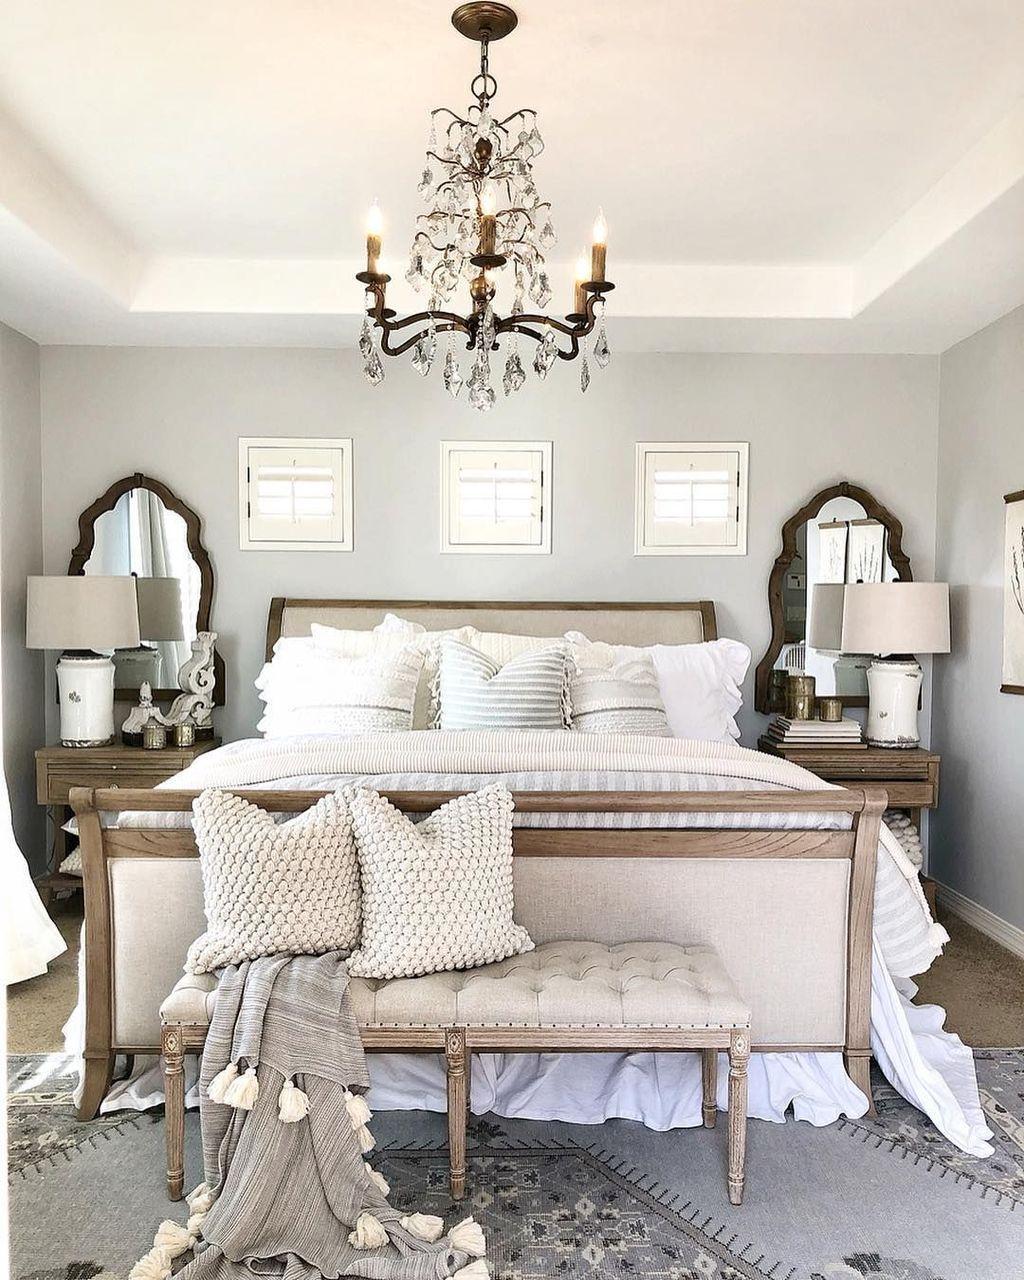 Romantic Room Decoration: 38 Lovely Romantic Master Bedroom Decorating Ideas